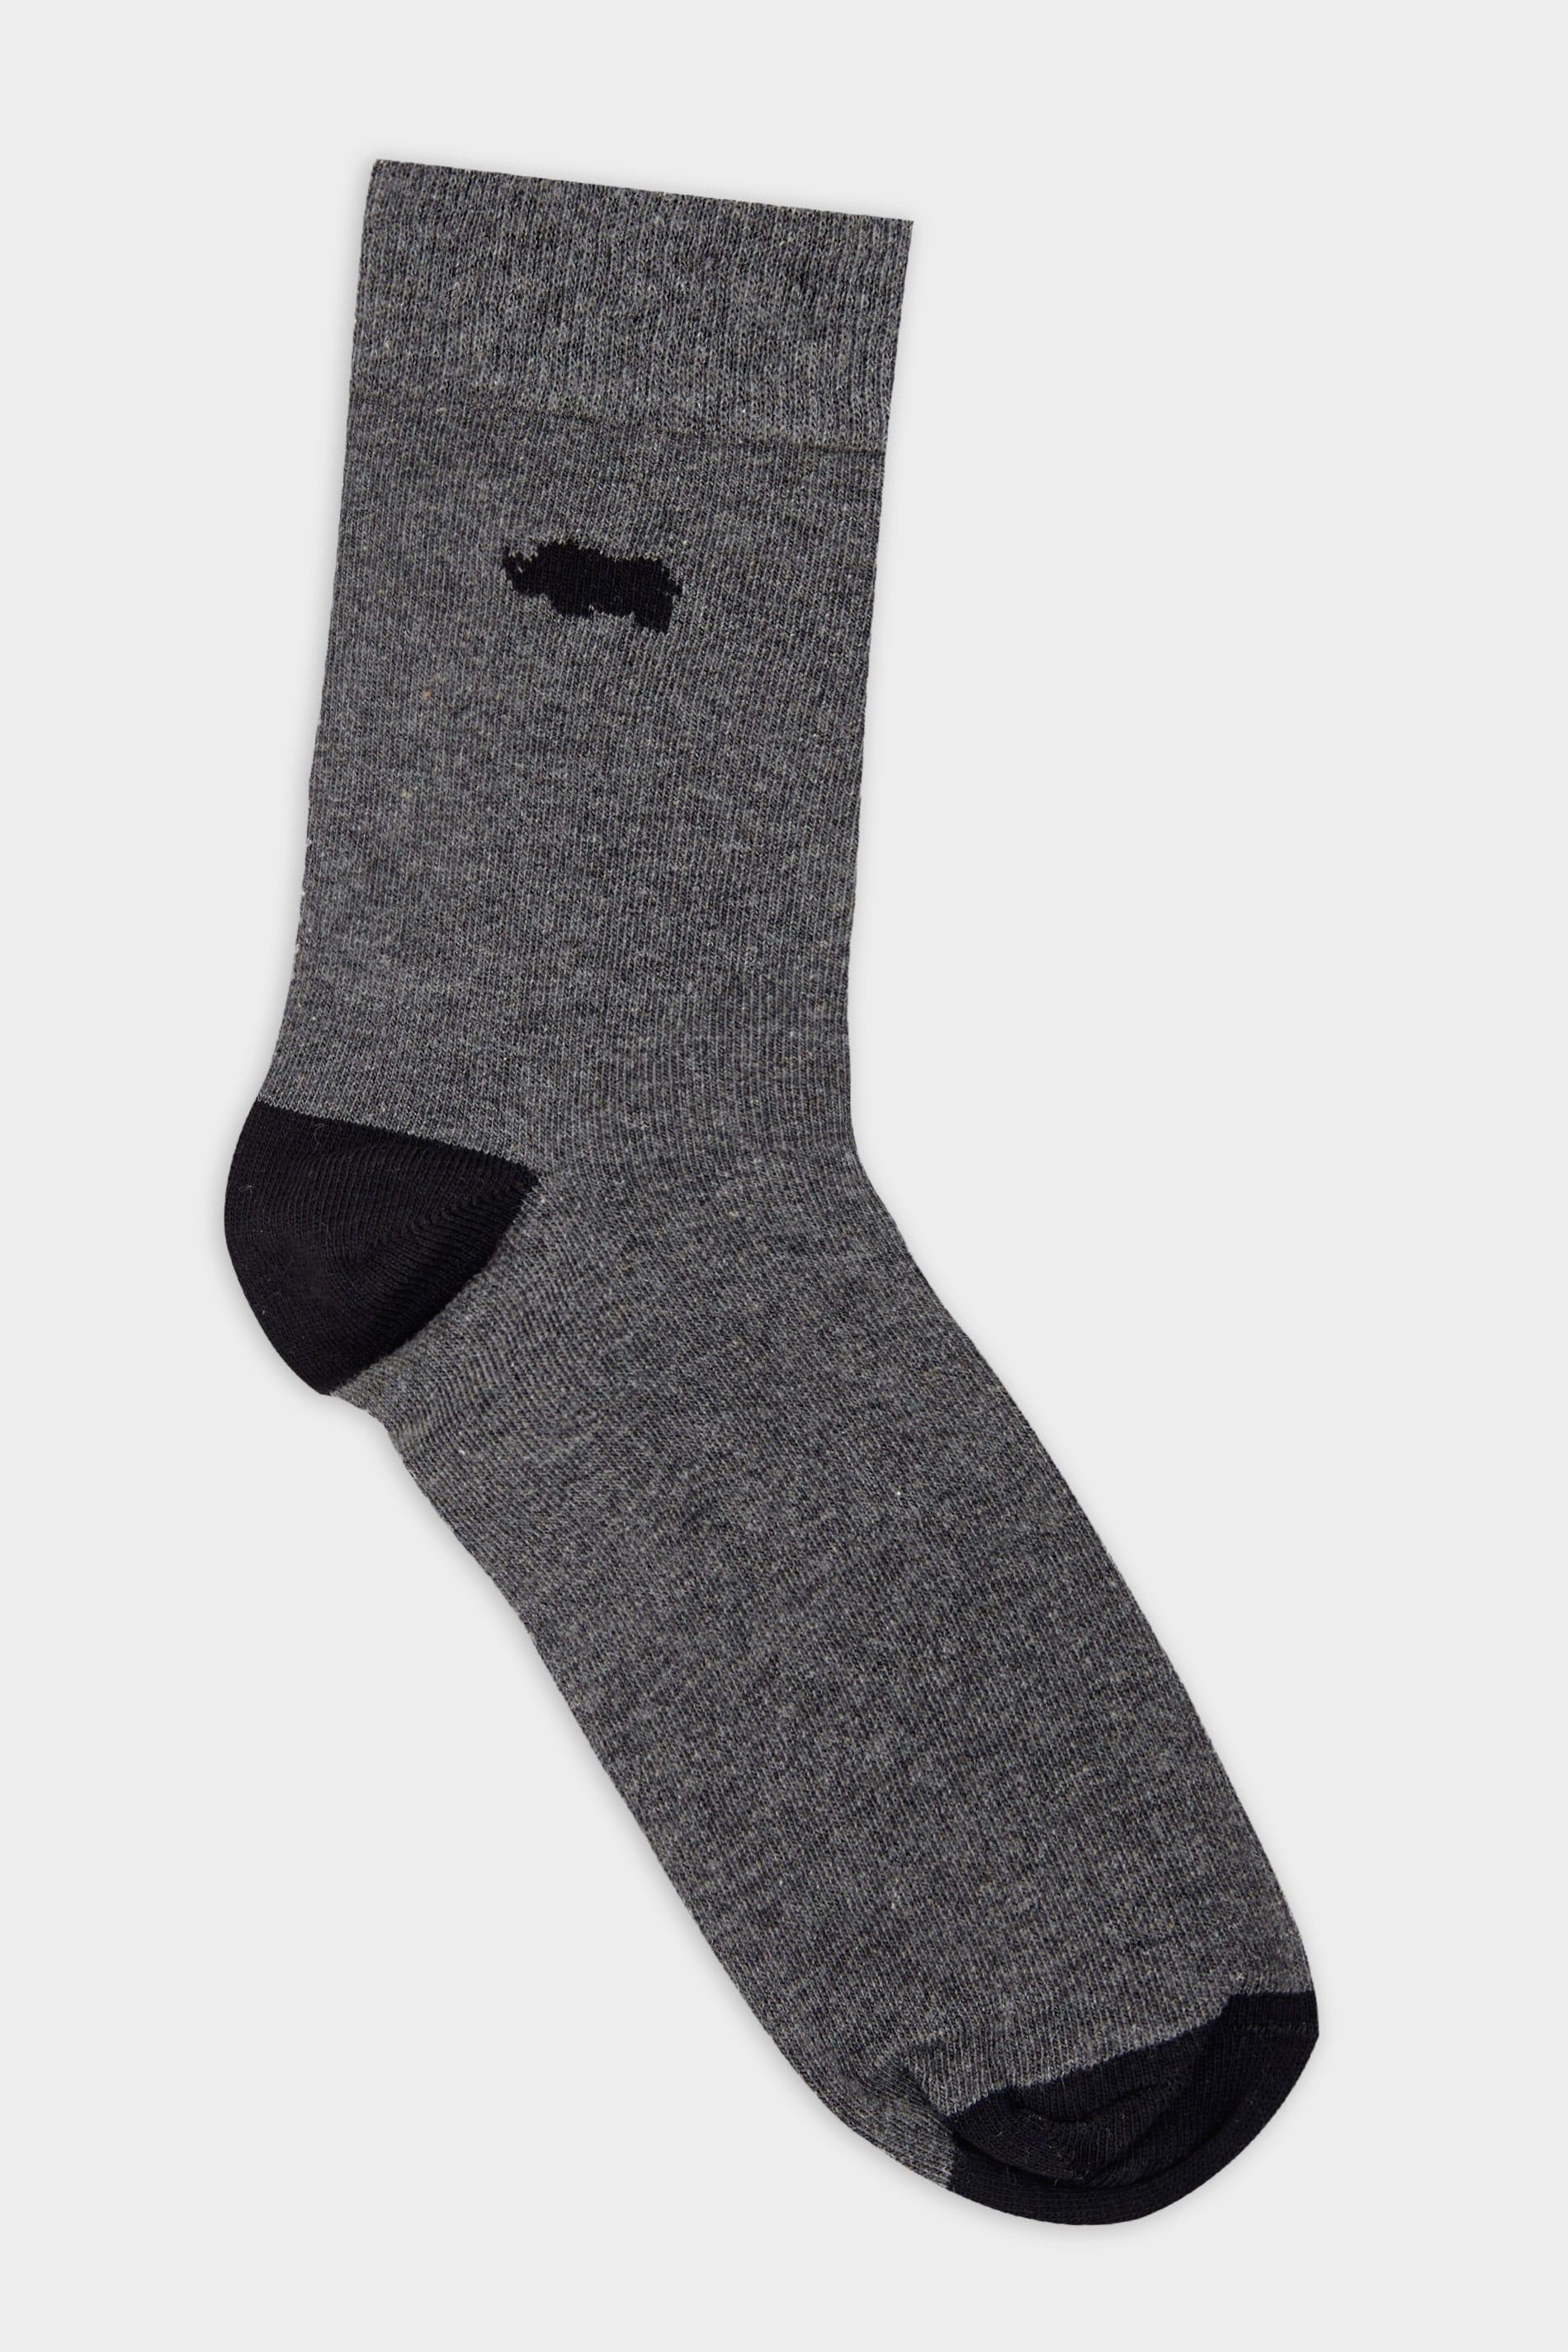 BadRhino Grey Socks With Black Contrast Heel & Toe